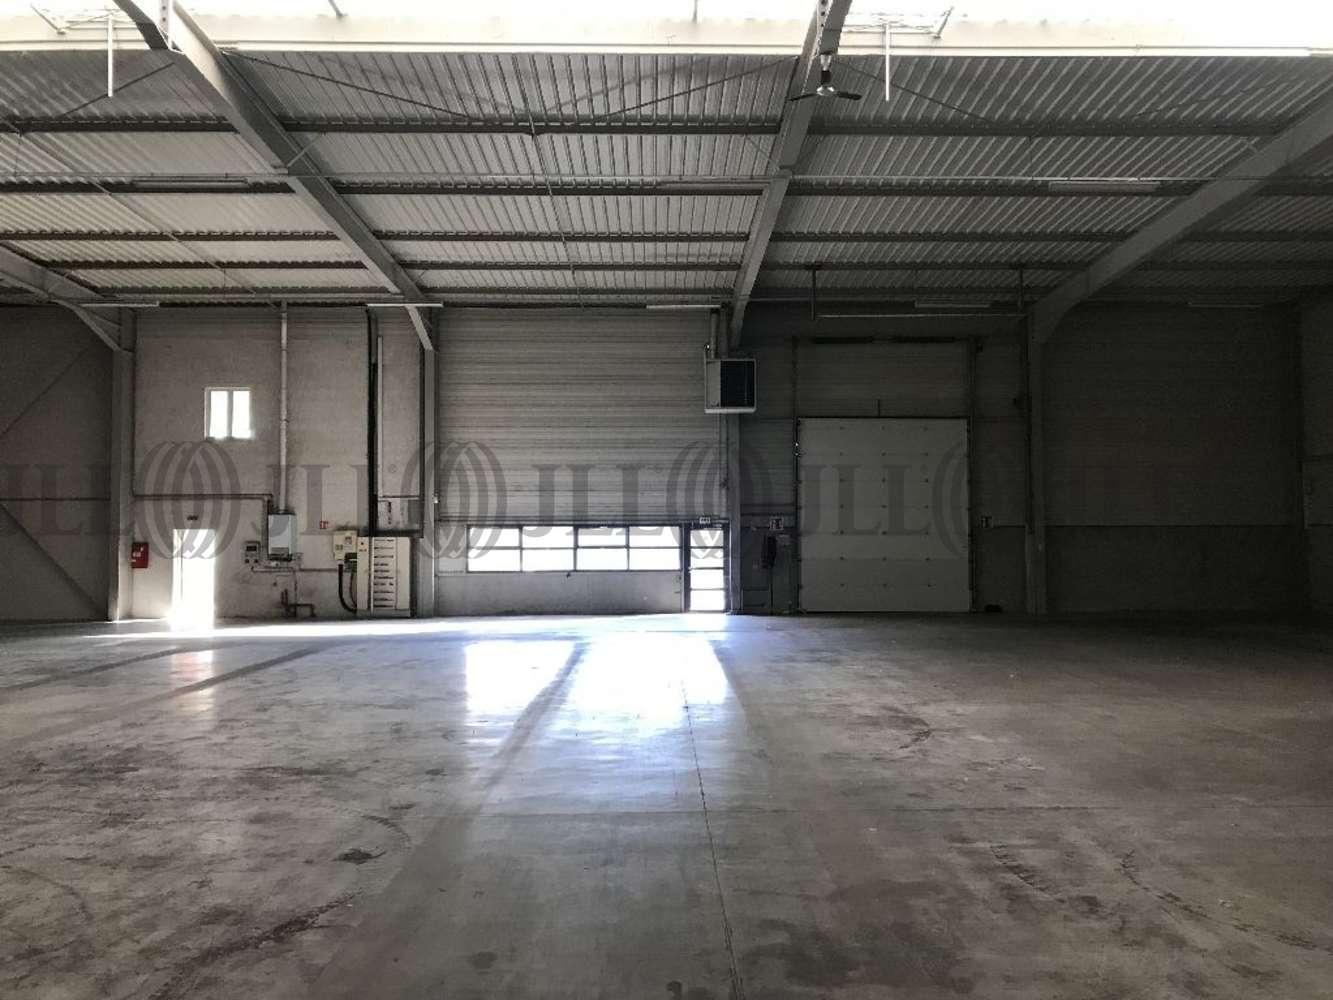 Activités/entrepôt Genas, 69740 - LOCATION ENTREPOT GENAS - 10026834